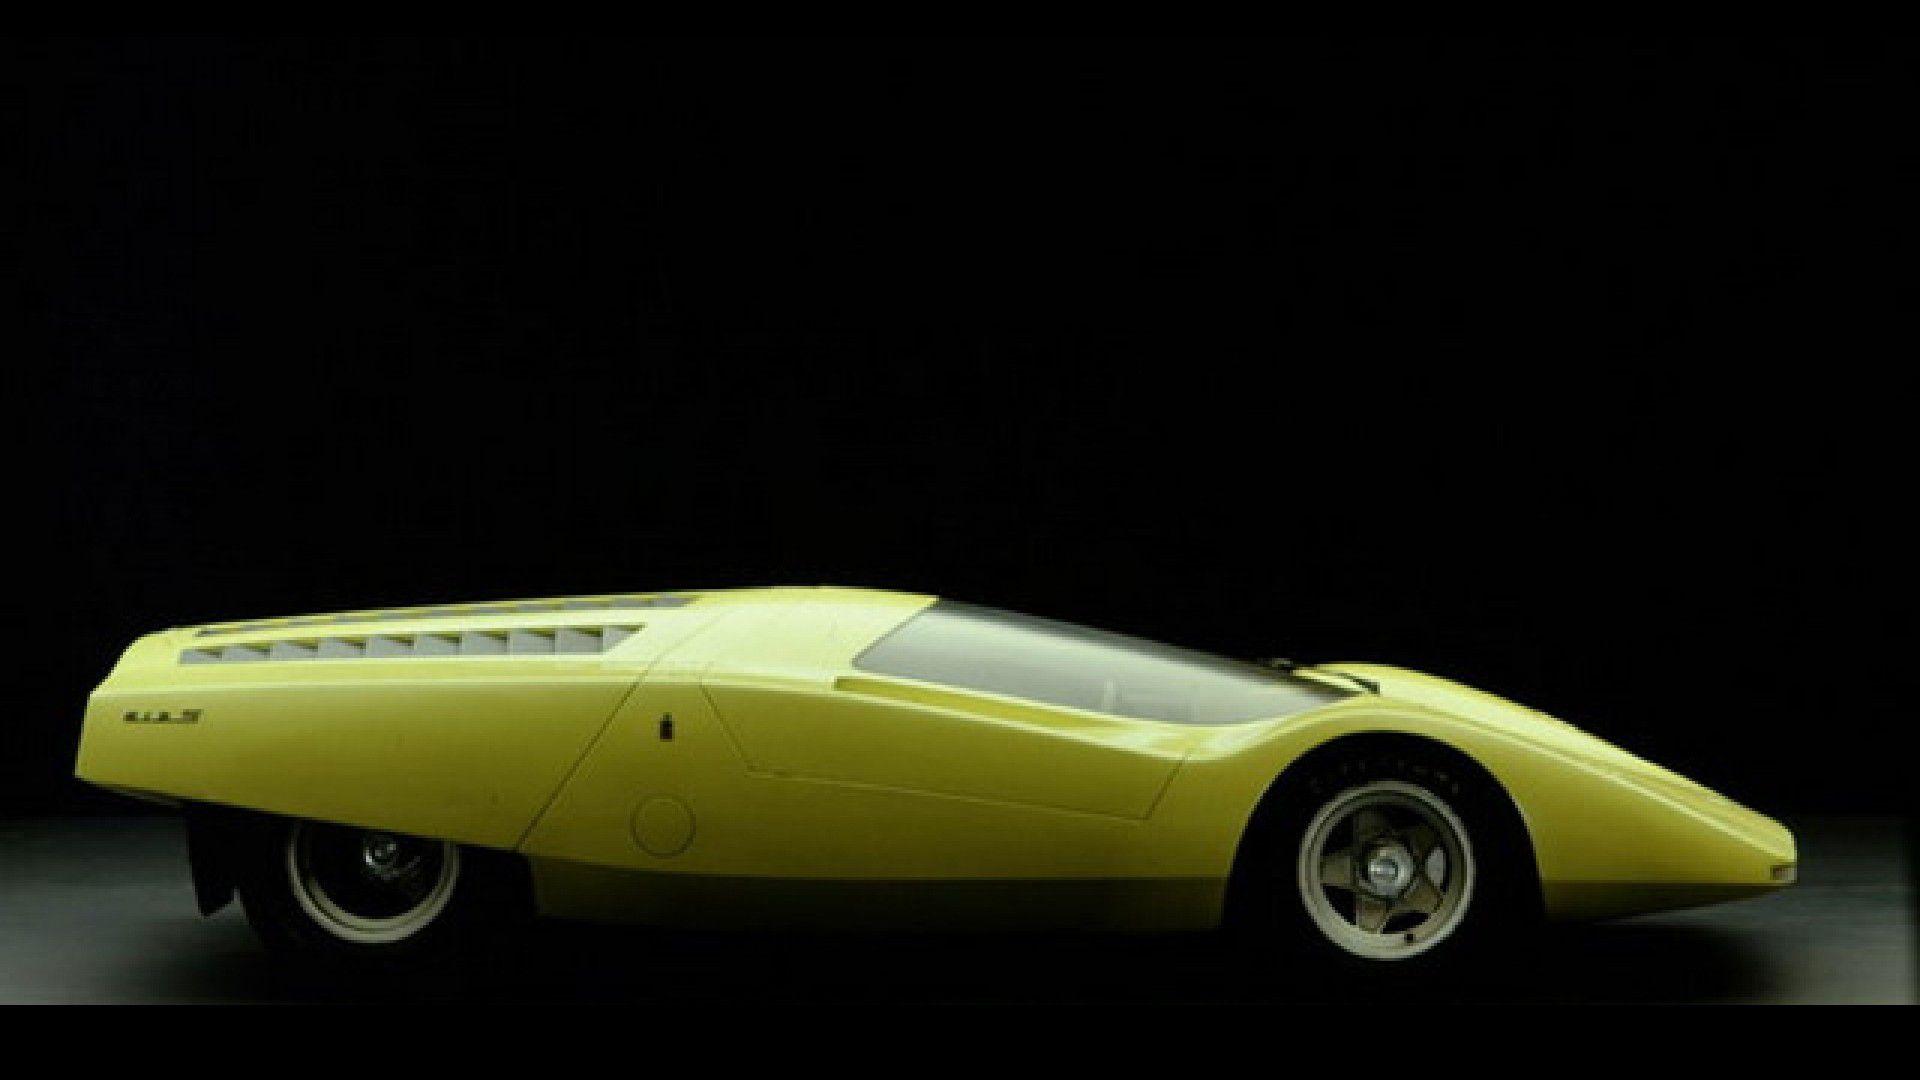 Ferrari Pininfarina 512S Berlinetta Speciale